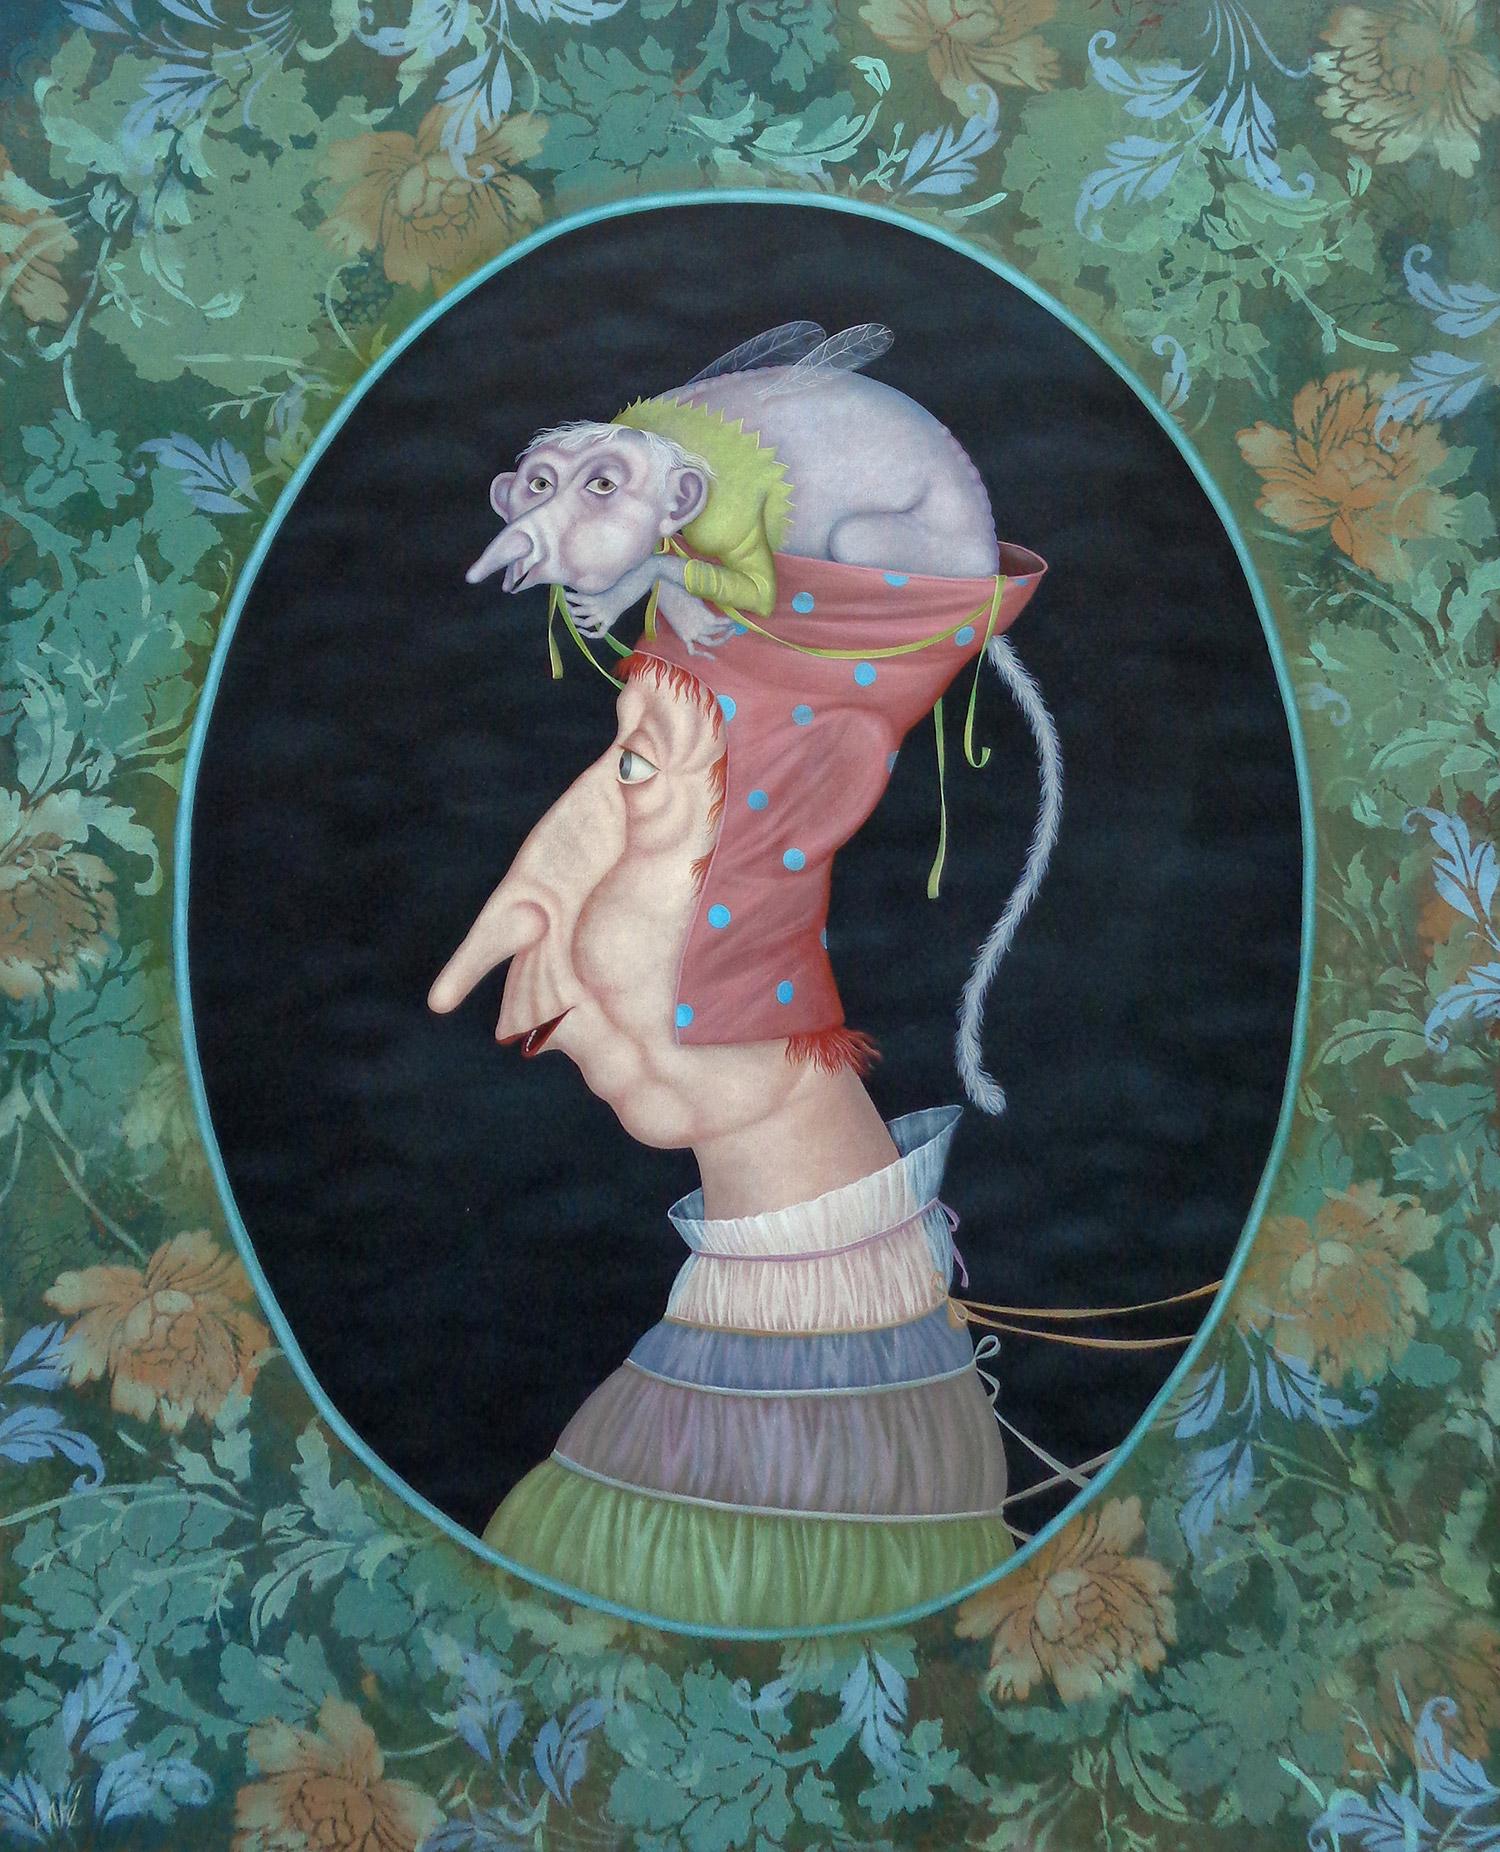 2_evgenia-sare-Muse-a-galerie-bettina-art-contemporain-paris